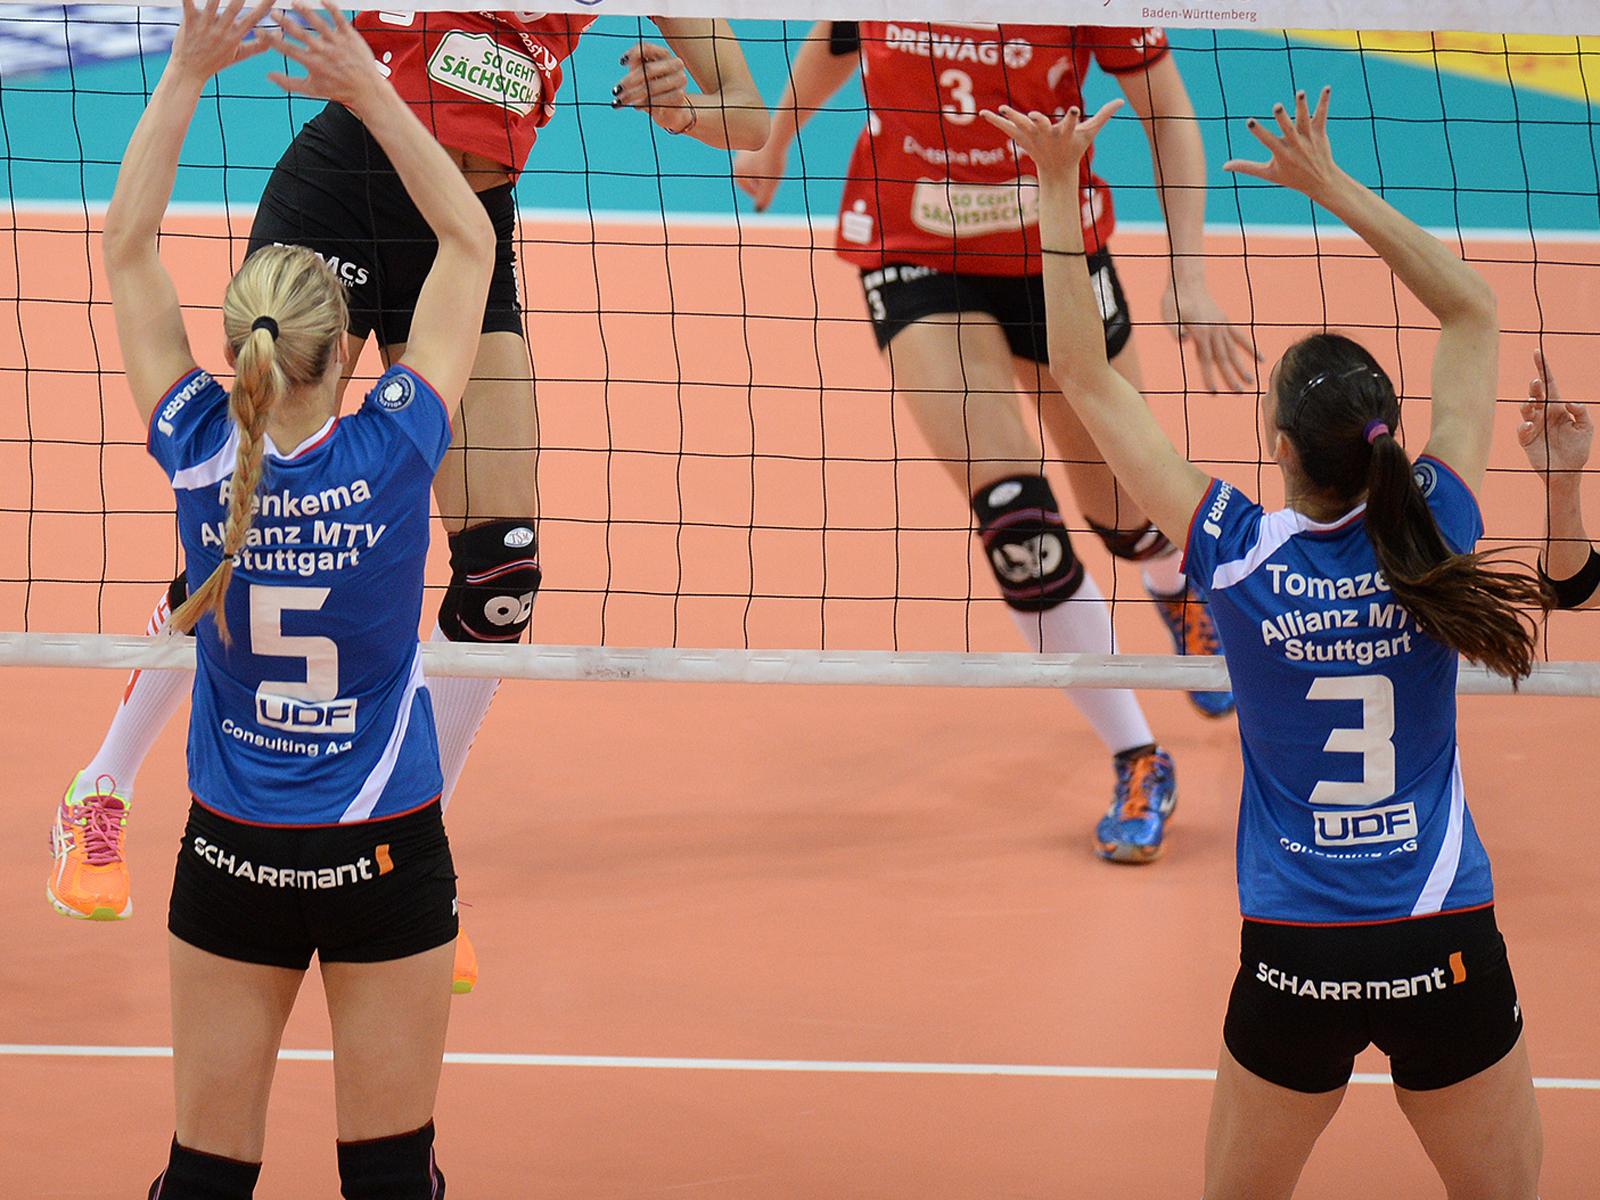 MTV Stuttgart: Porno-Skandal in der Volleyball-Bundesliga